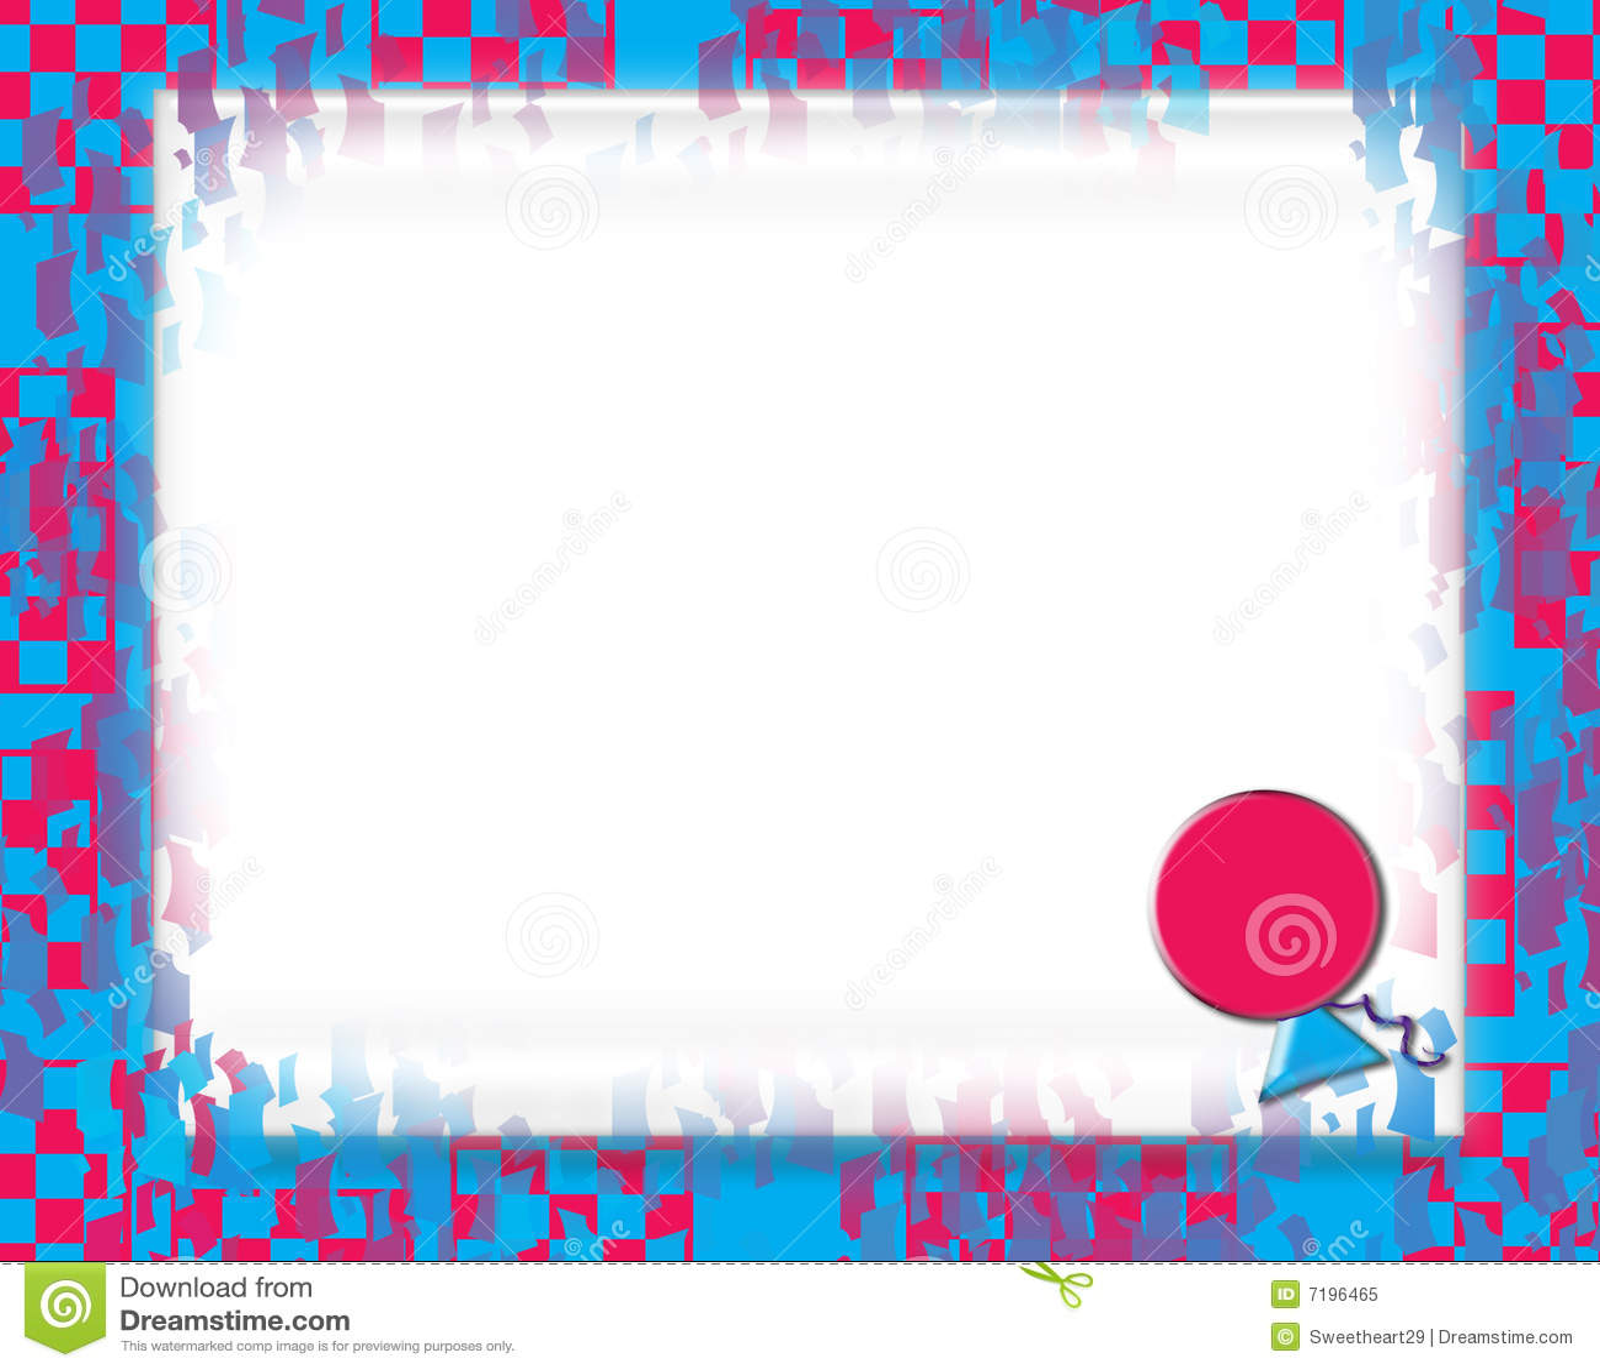 Birthday Invitation 4 Stock Illustration. Illustration Of